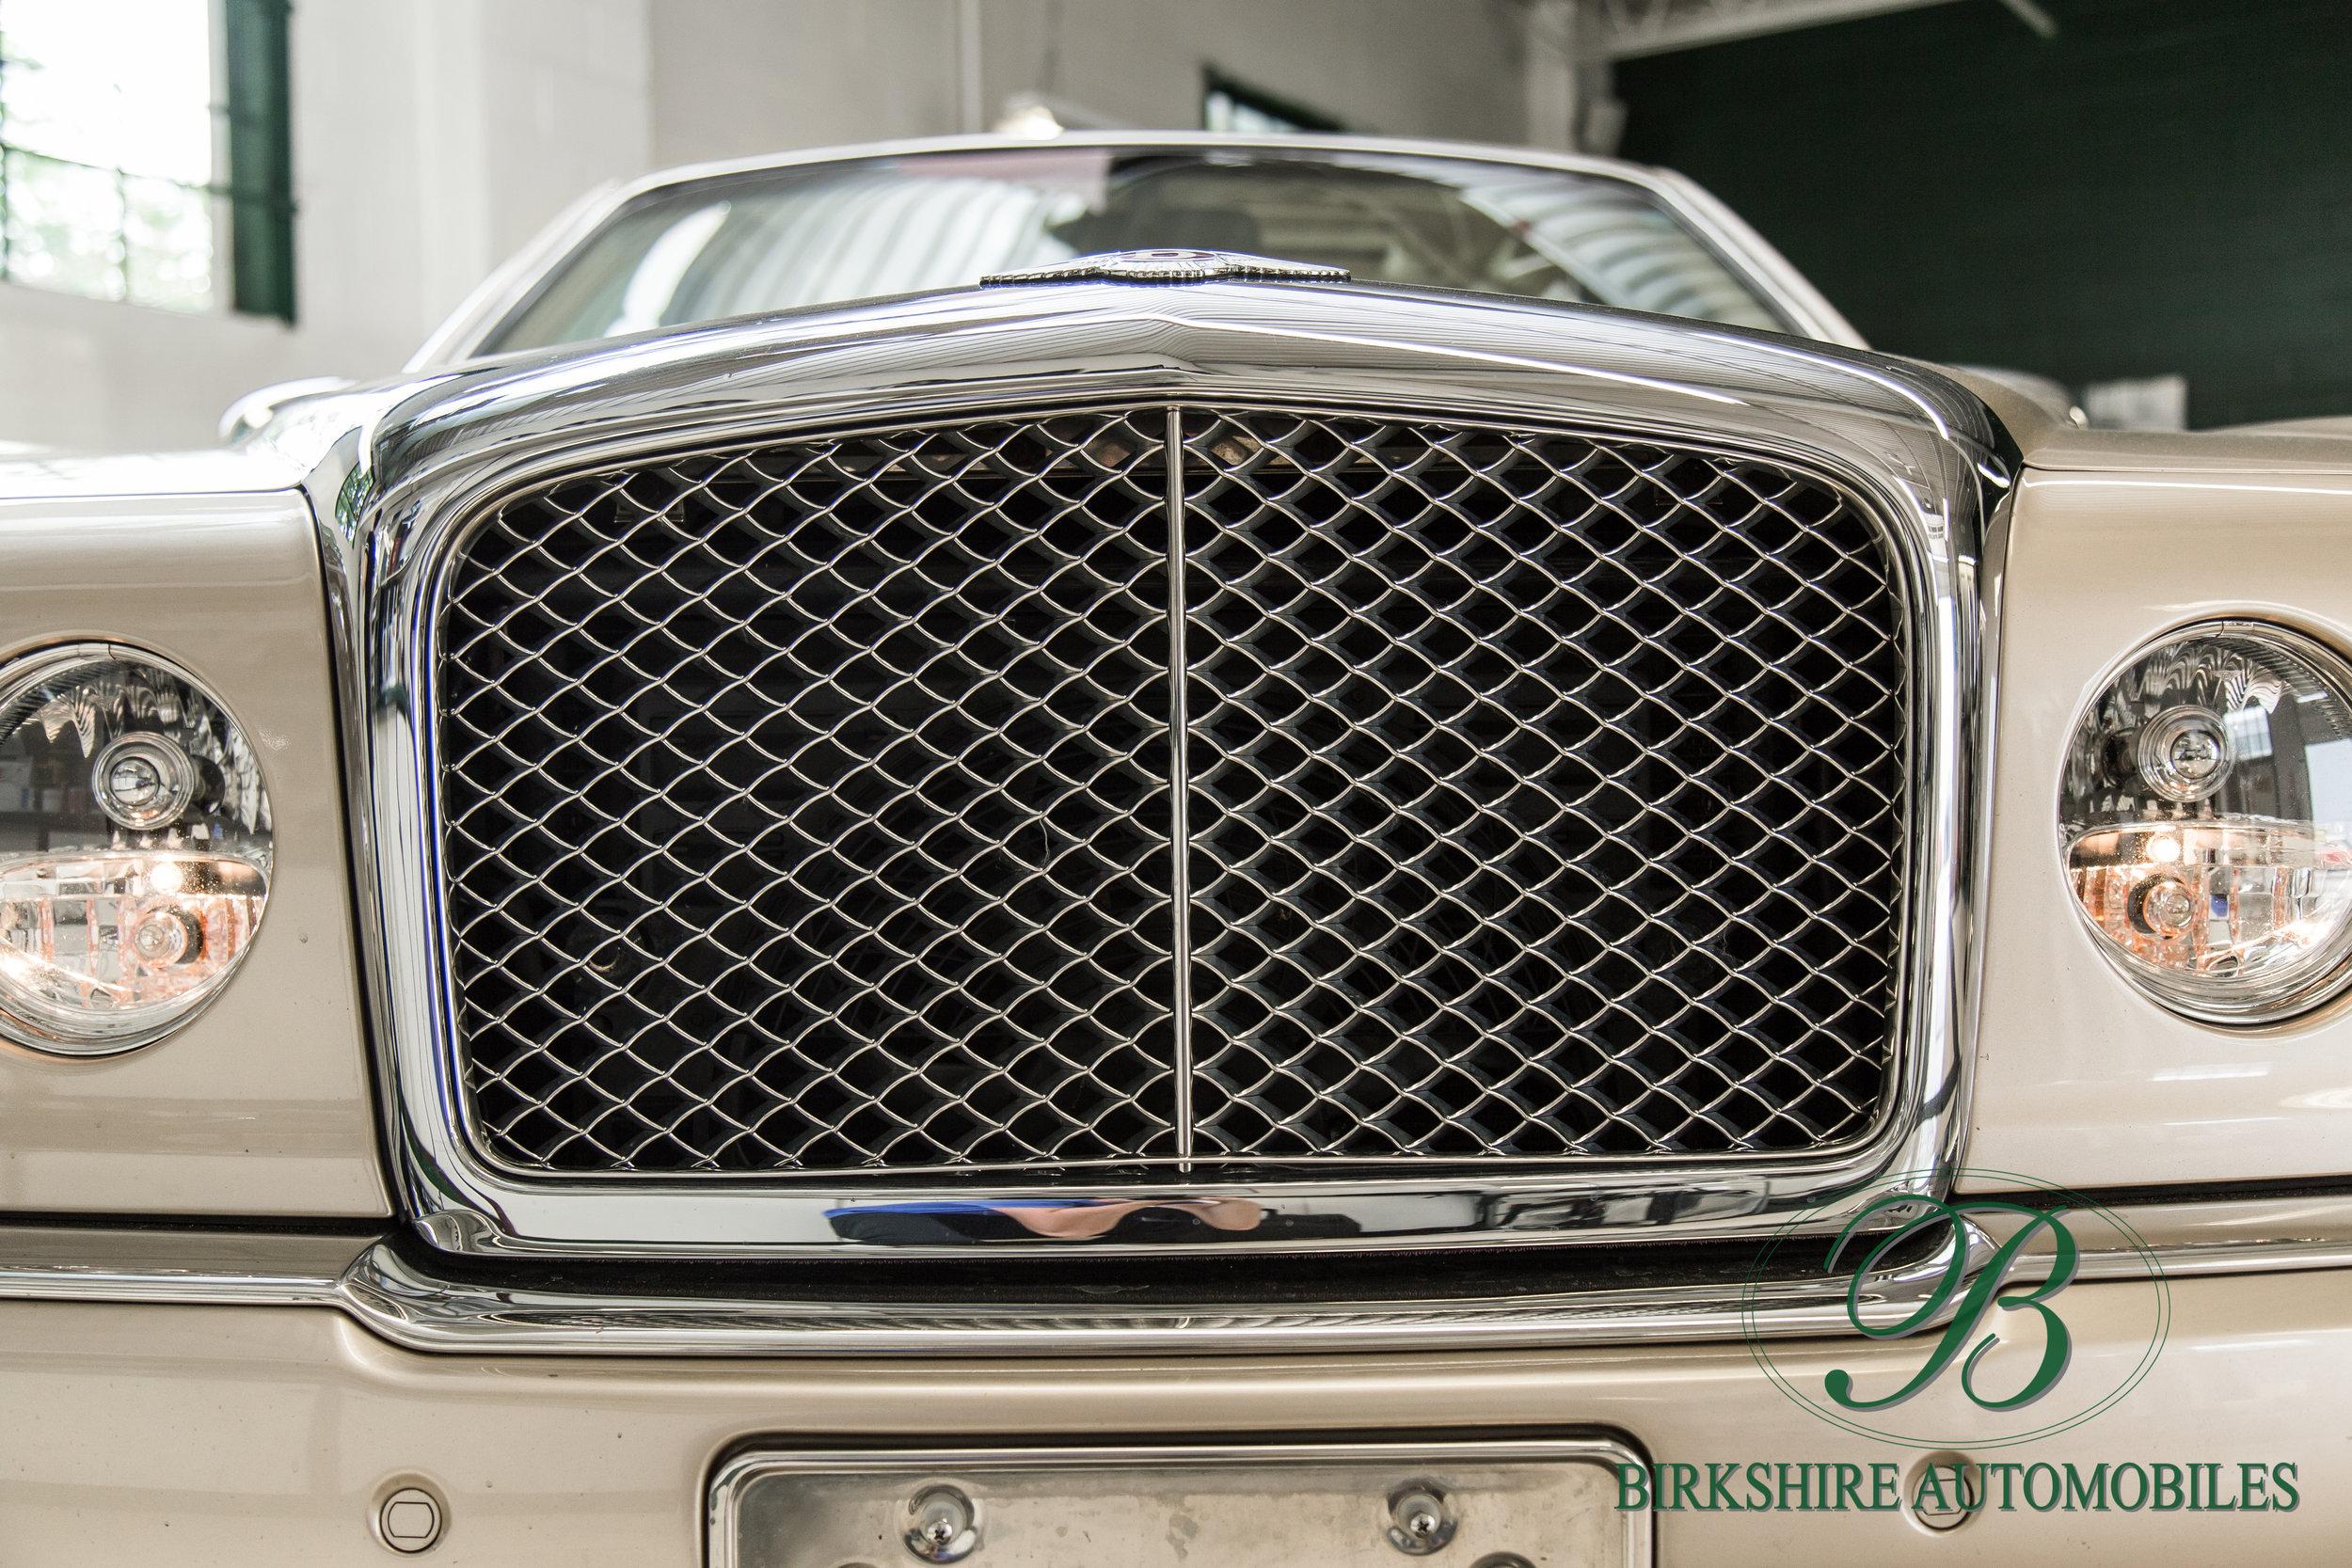 Birkshire Automobiles-324.jpg